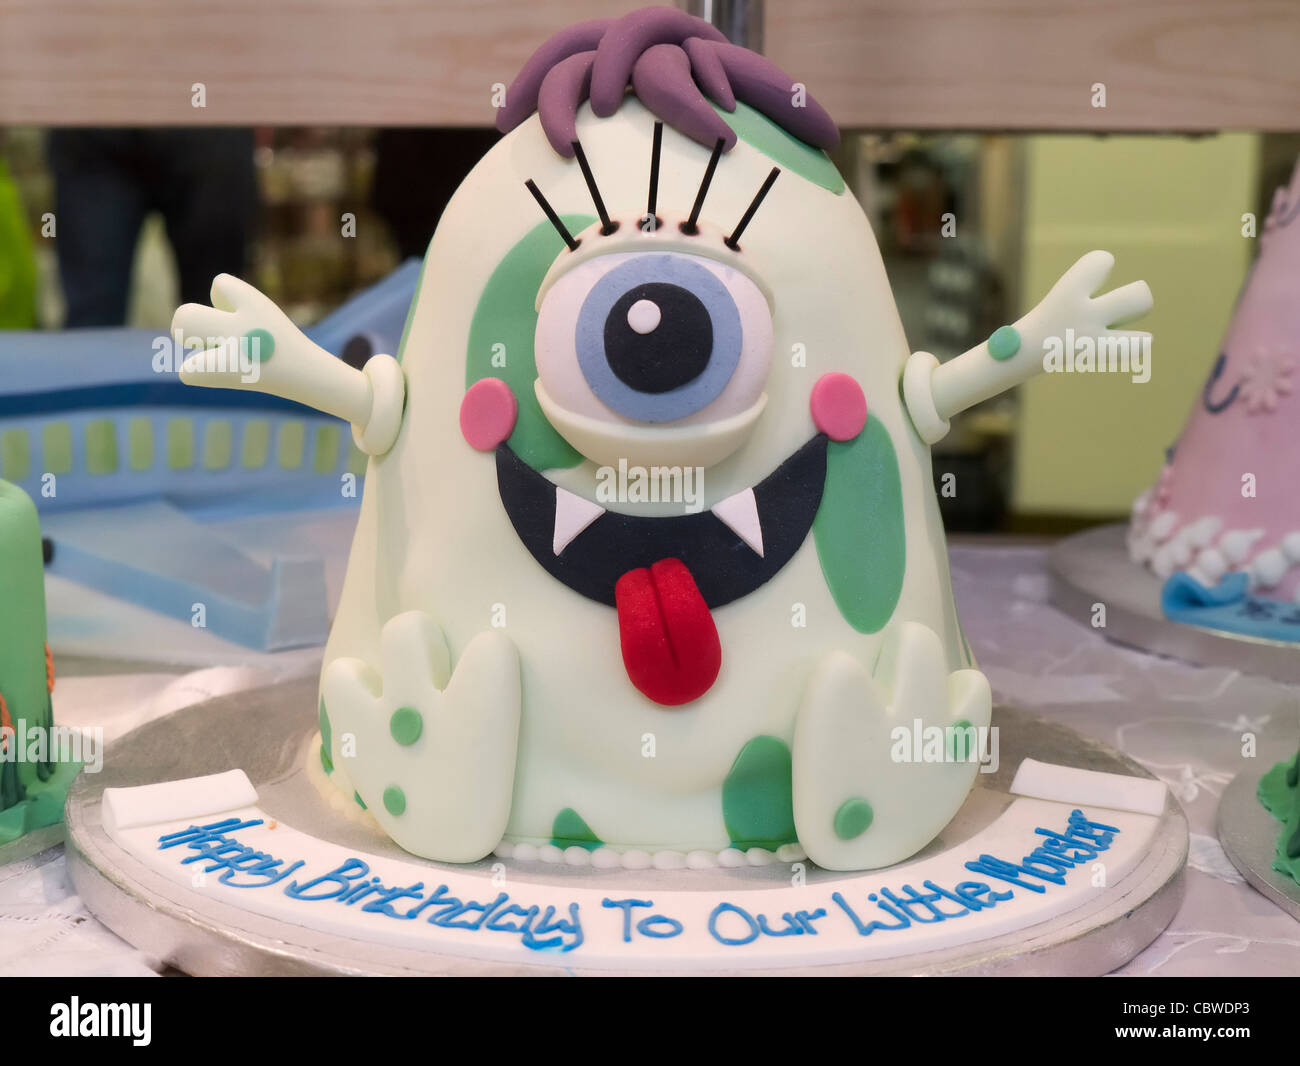 Phenomenal Imaginative Little Monster Birthday Cake Oxford Covered Market Personalised Birthday Cards Arneslily Jamesorg